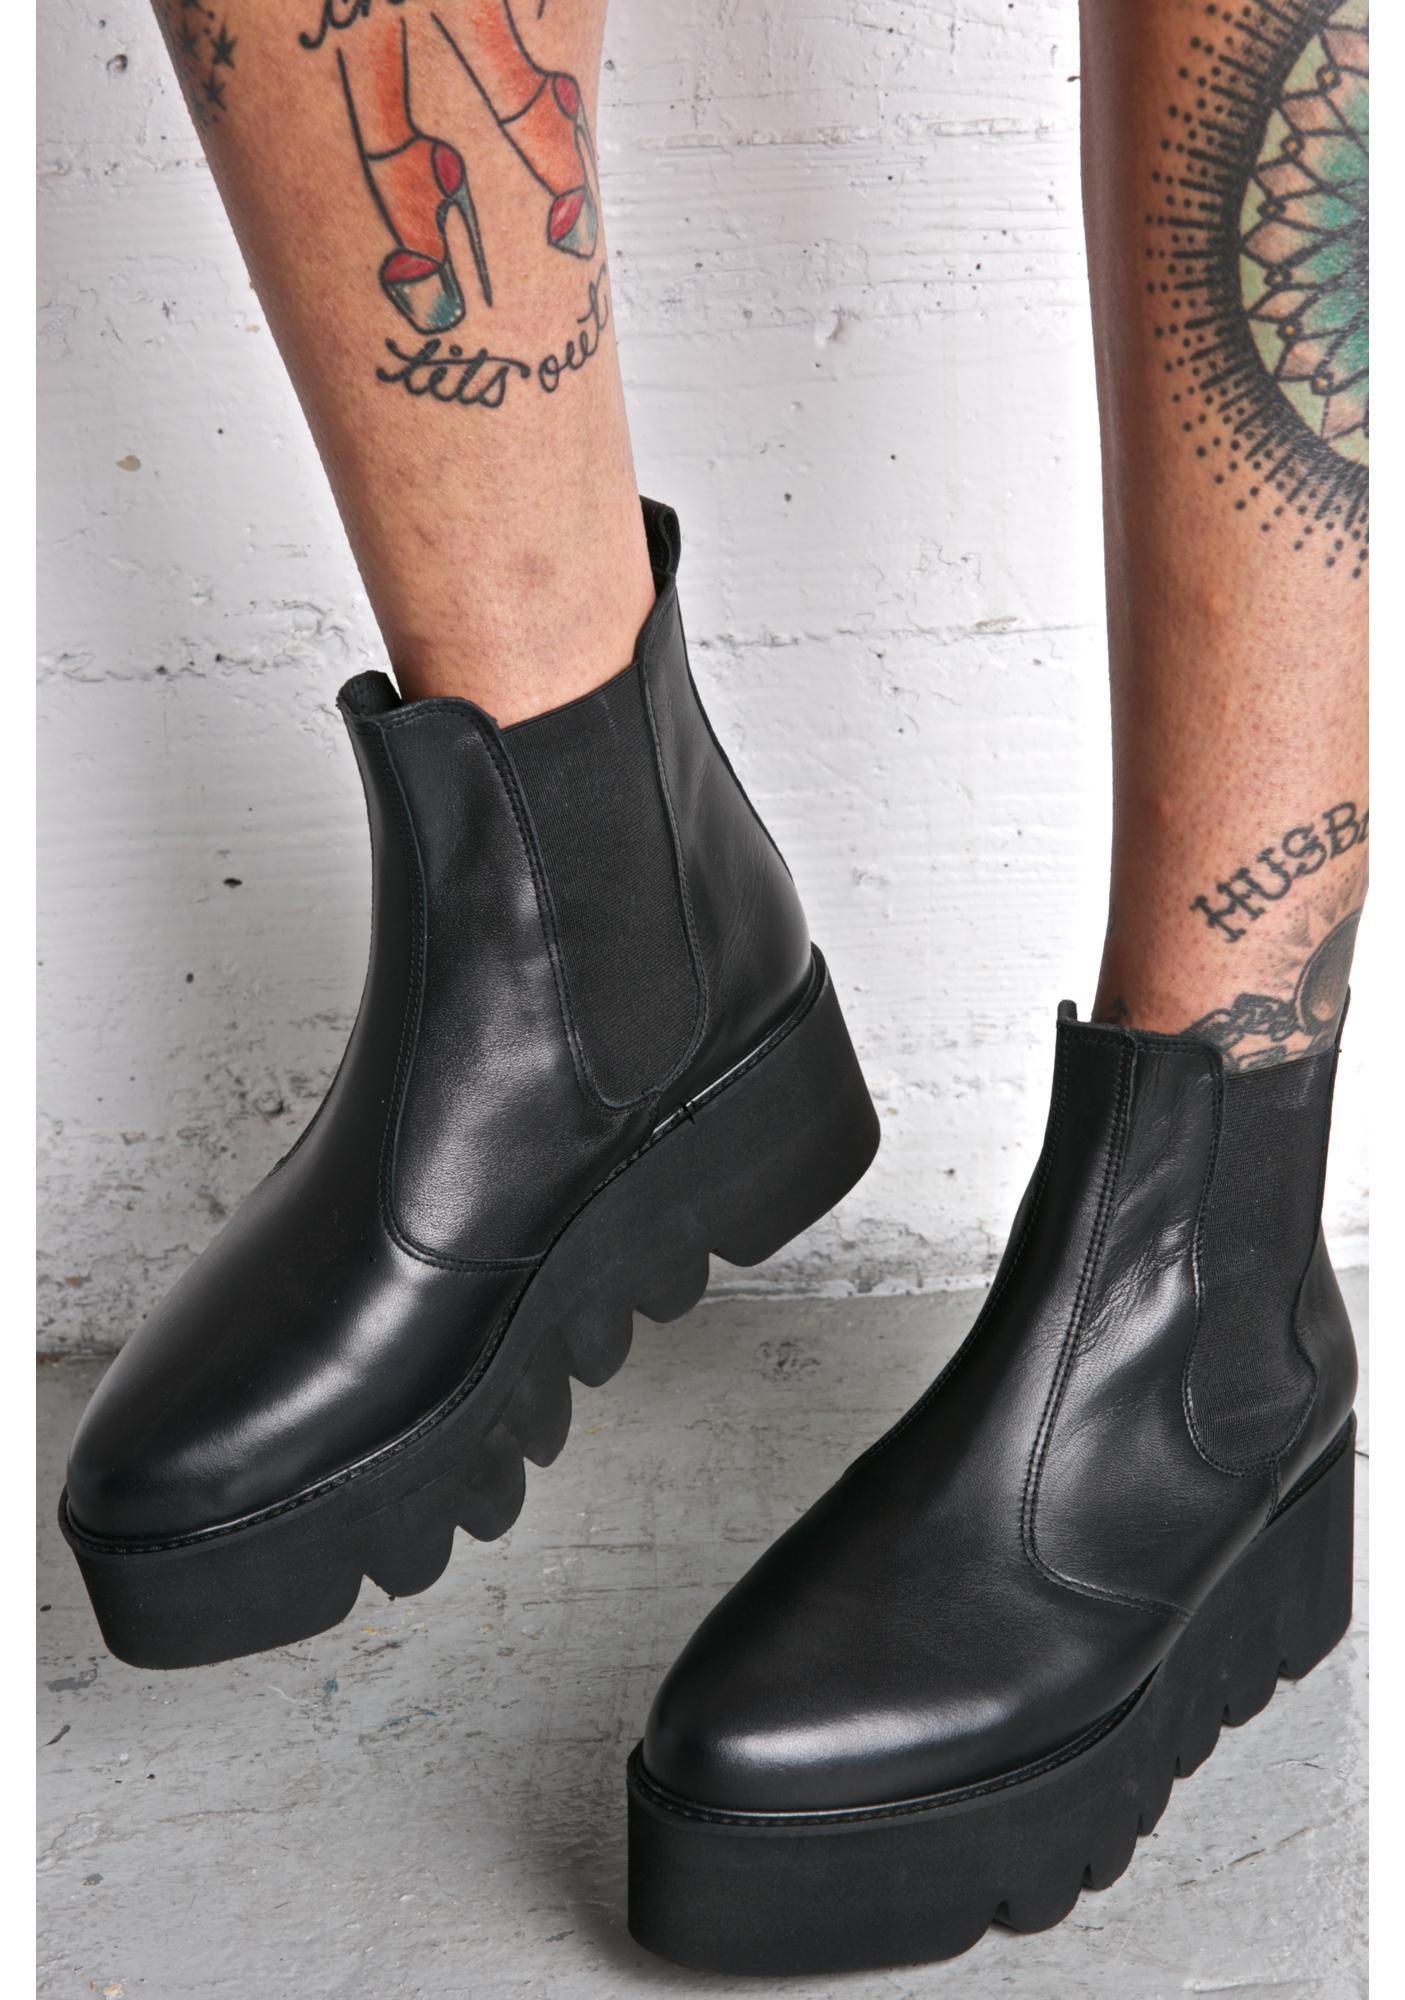 Shellys London Chelsea Boots